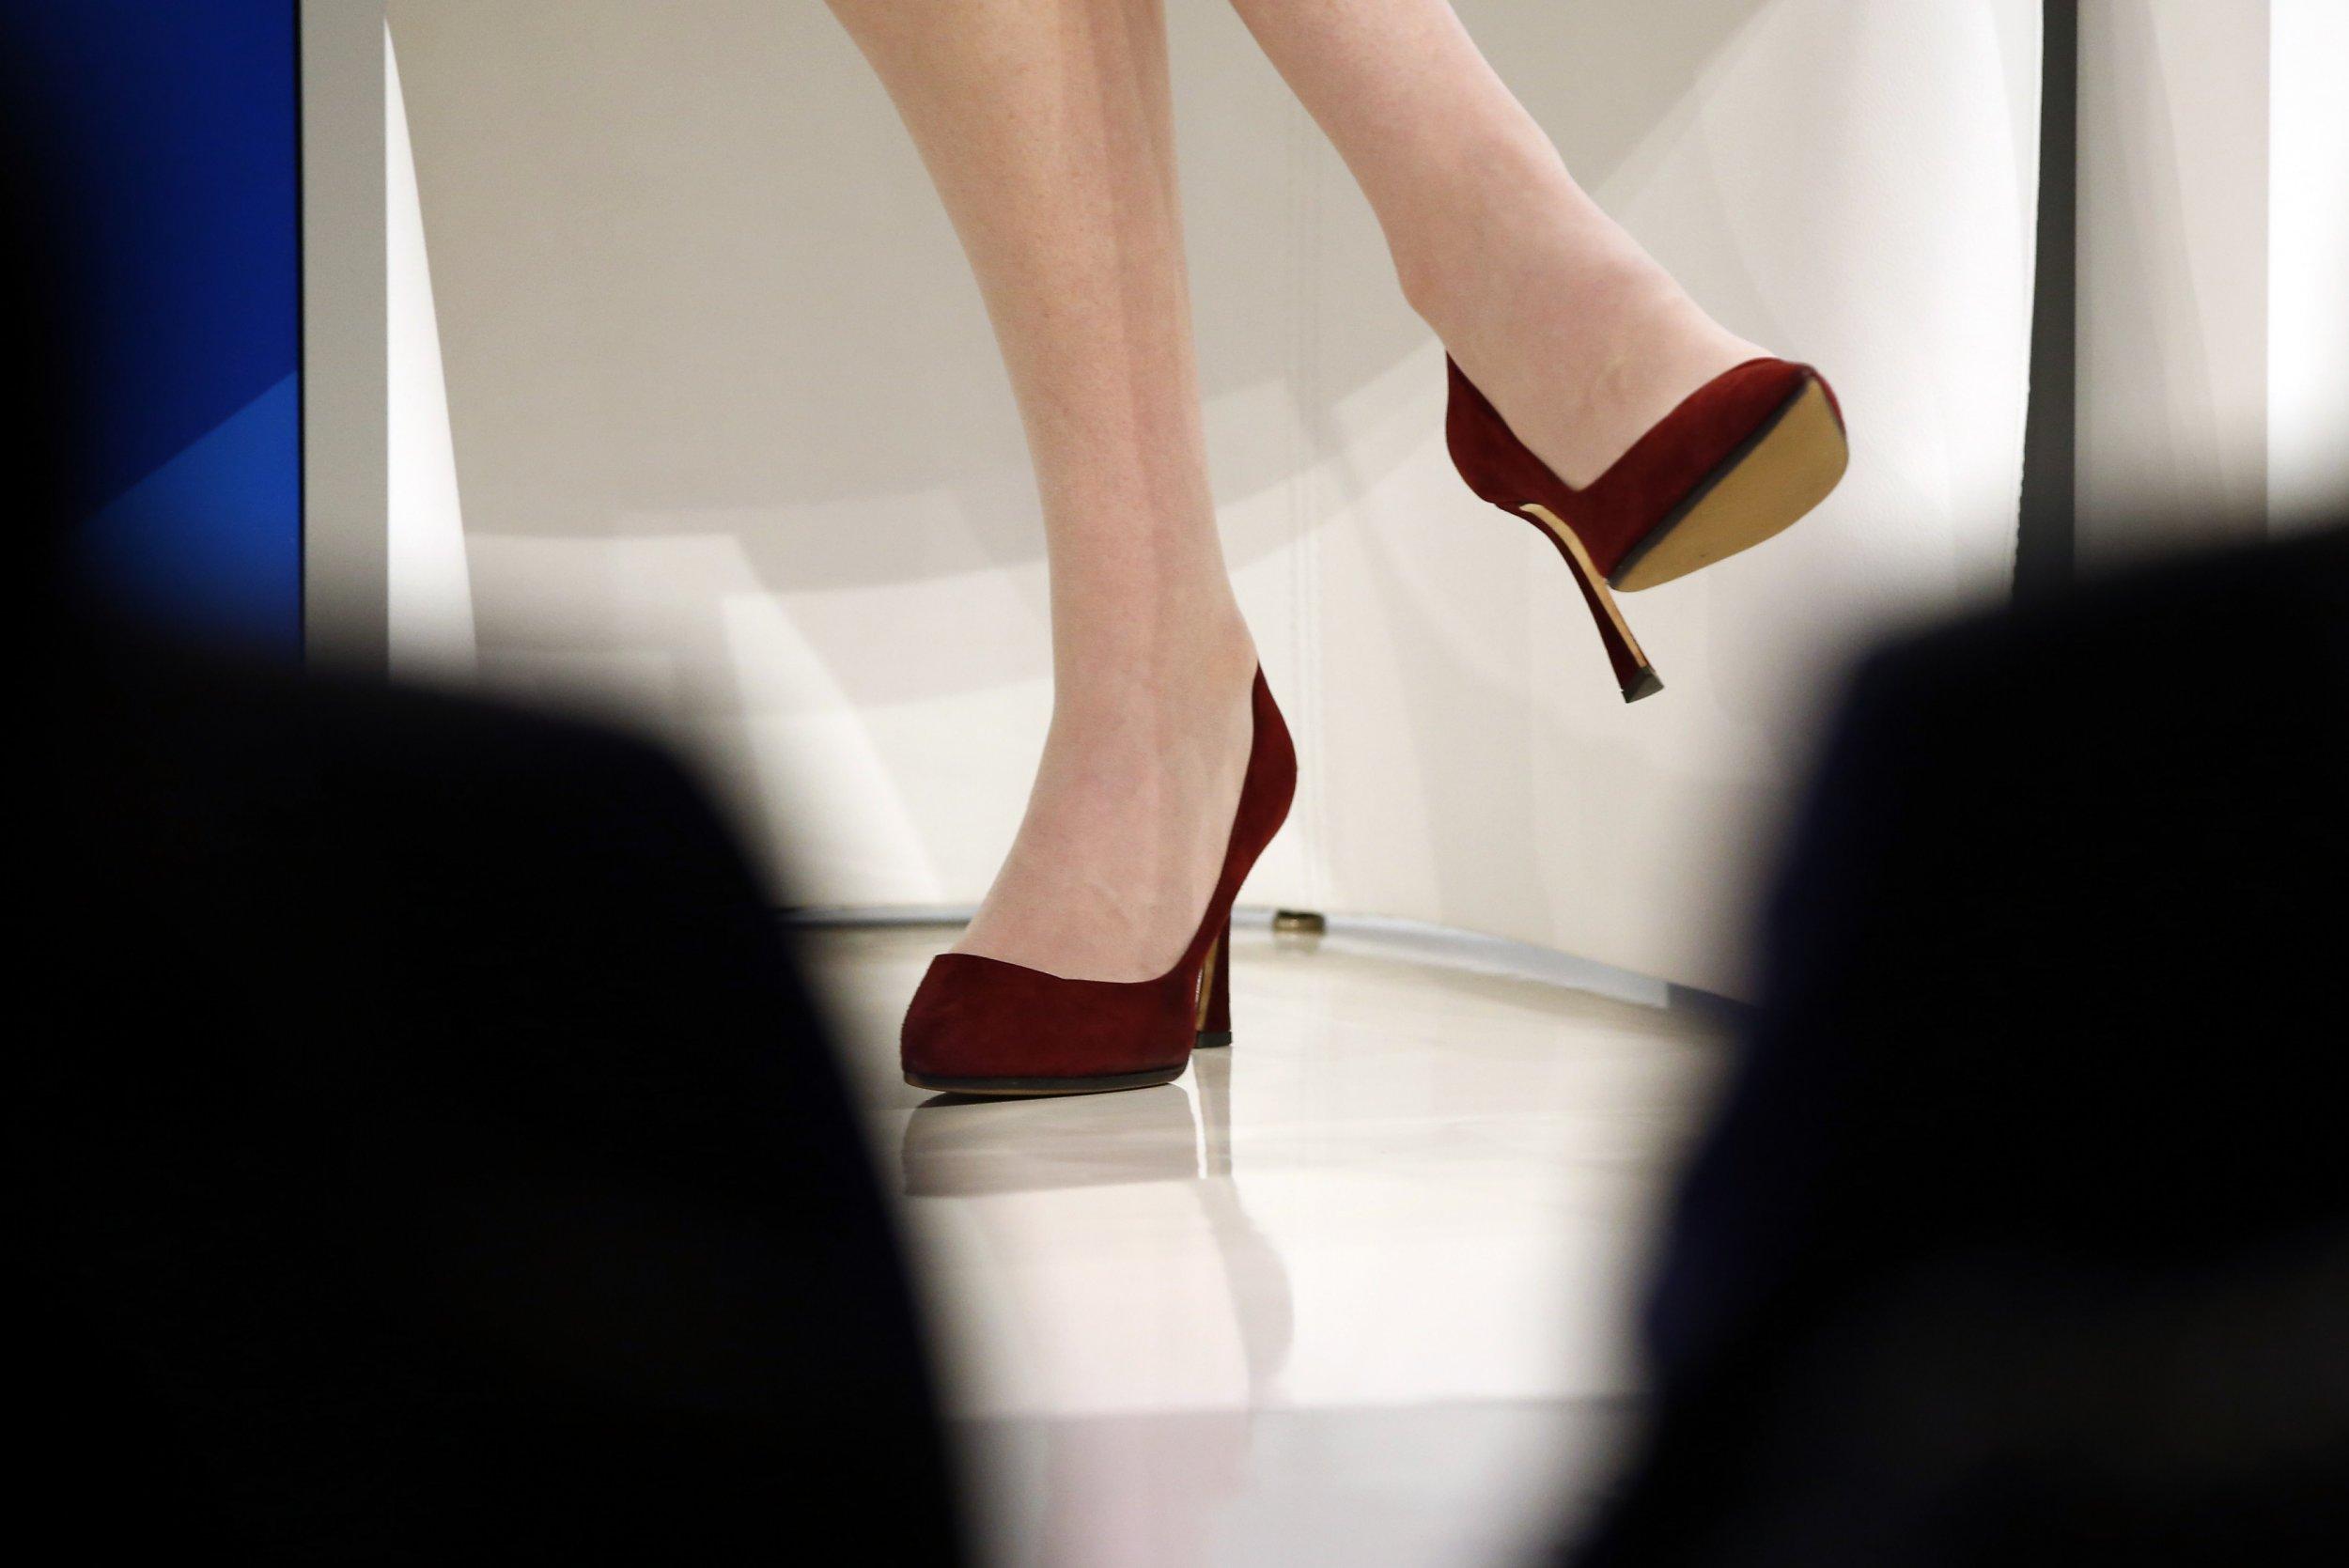 Sheryl Sandberg's high heels